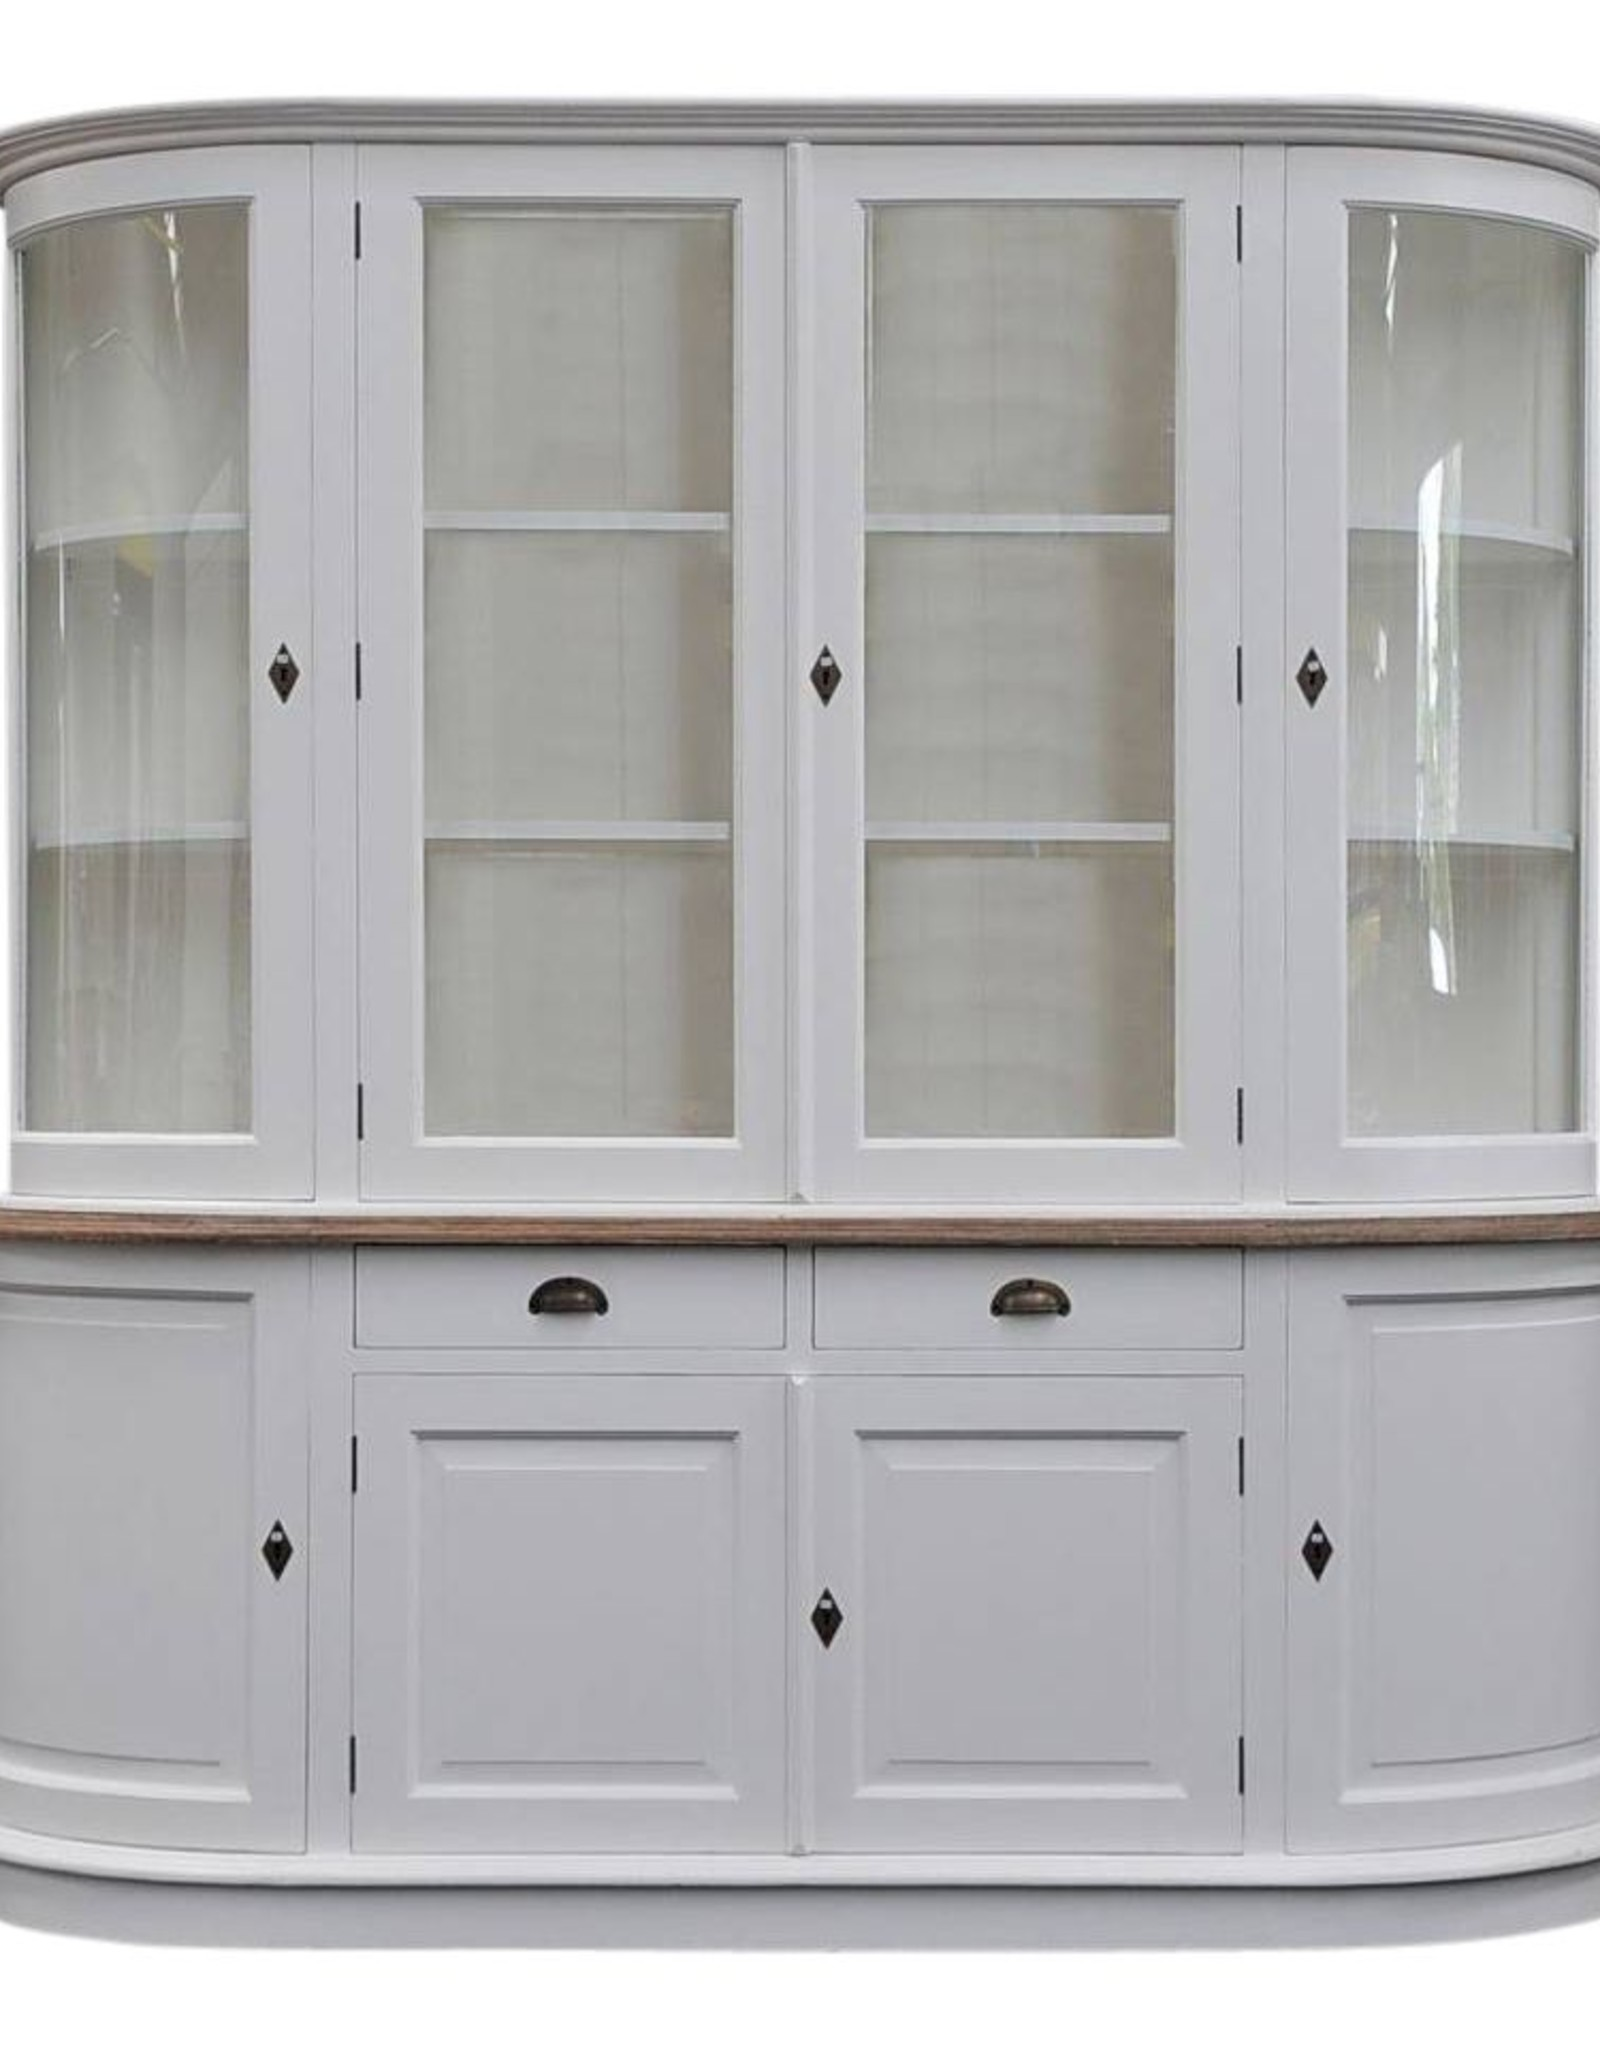 Arrondi placard Cabinet